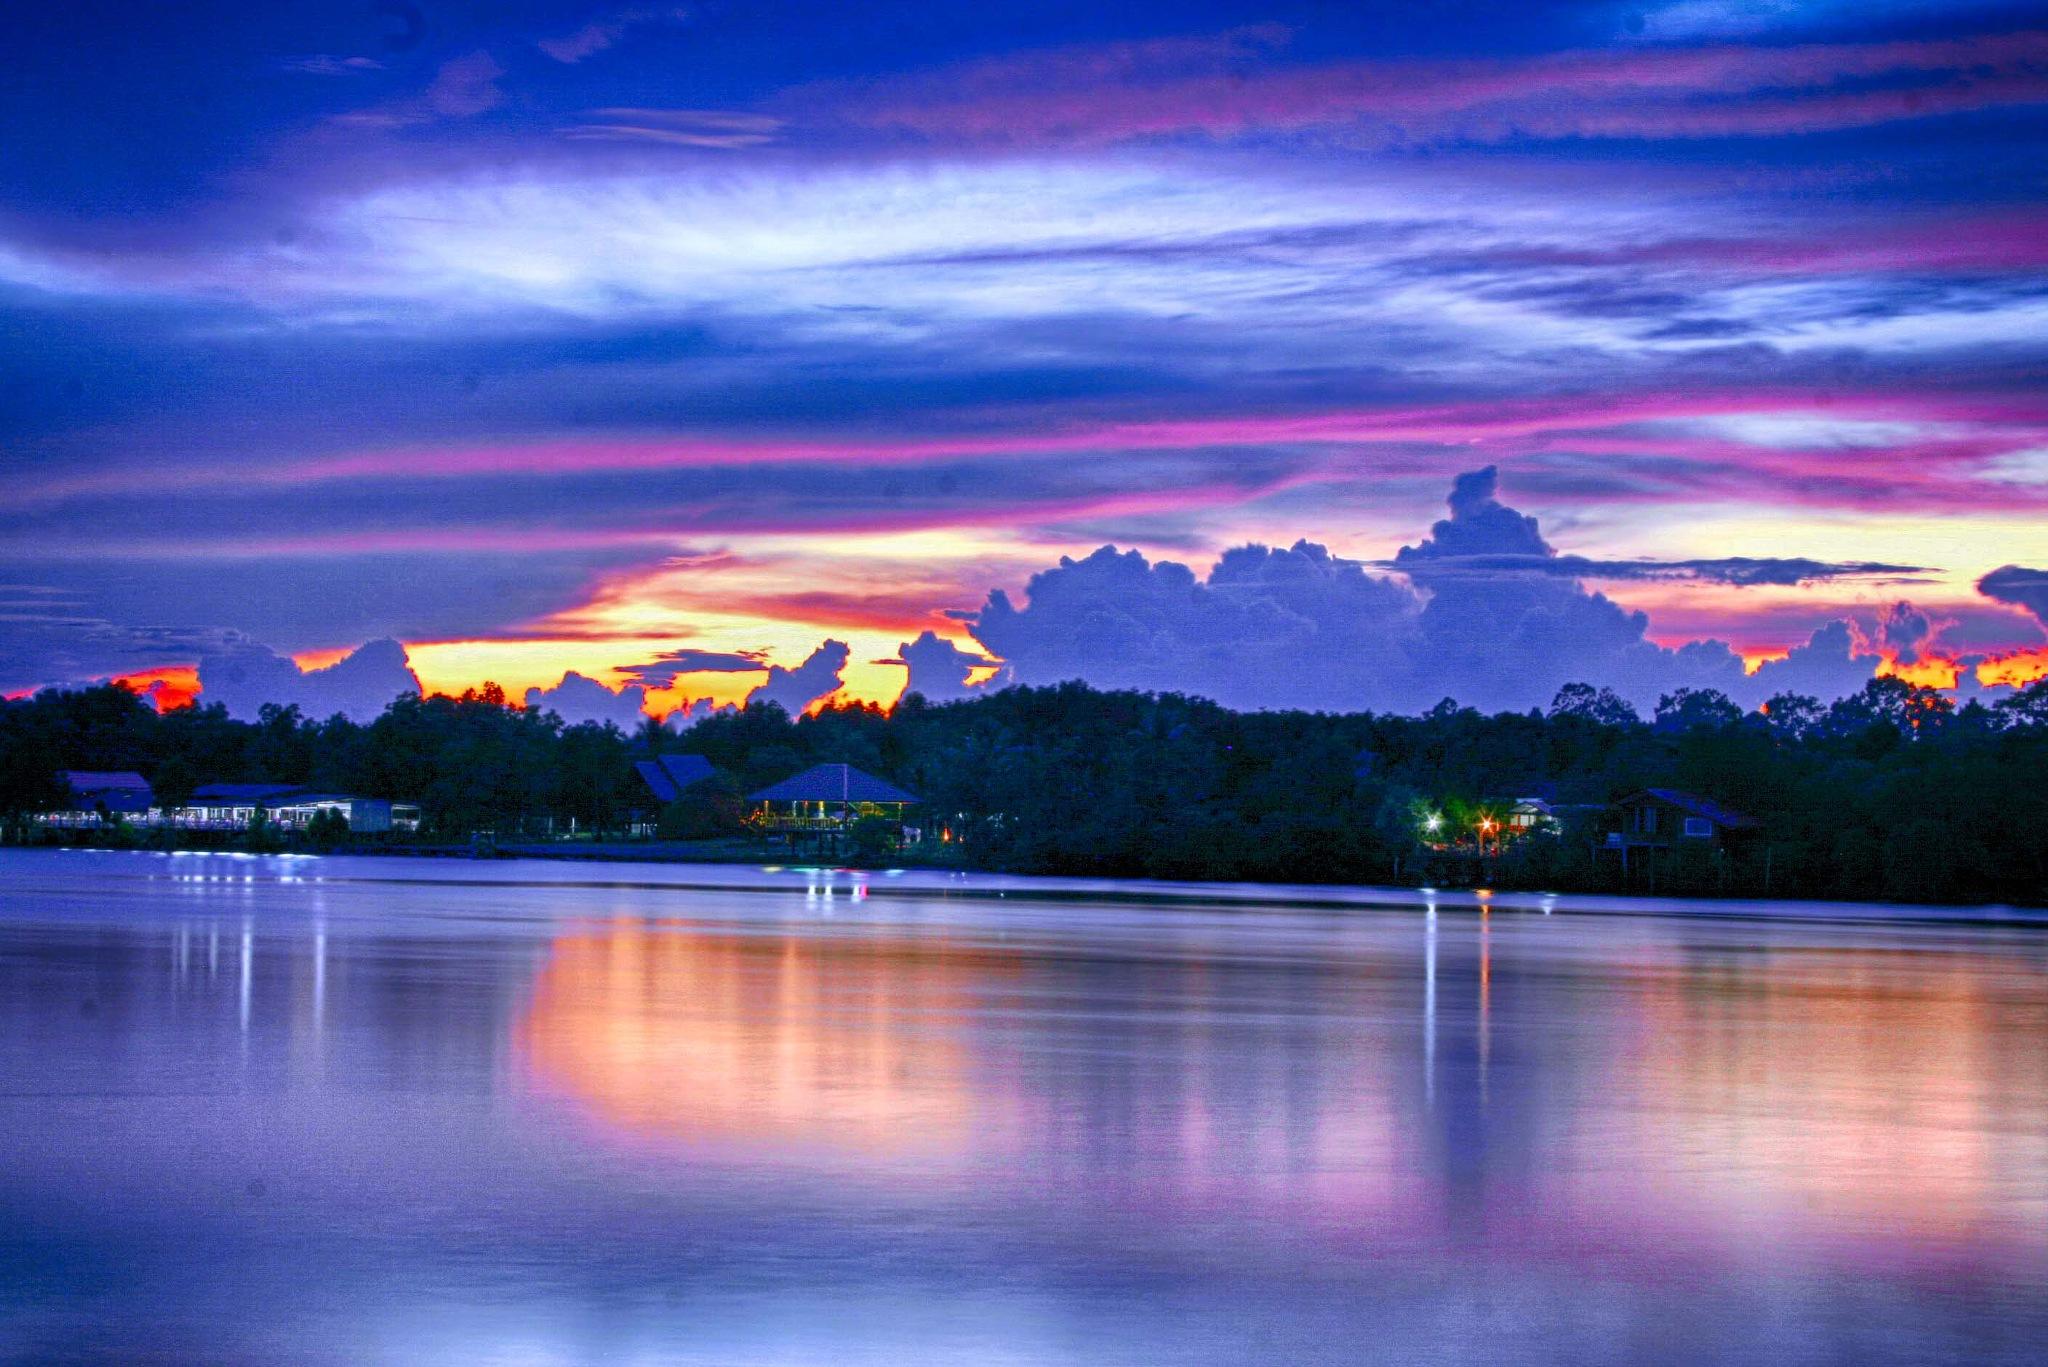 Evening in Thailand by Rungsak Rintharasri